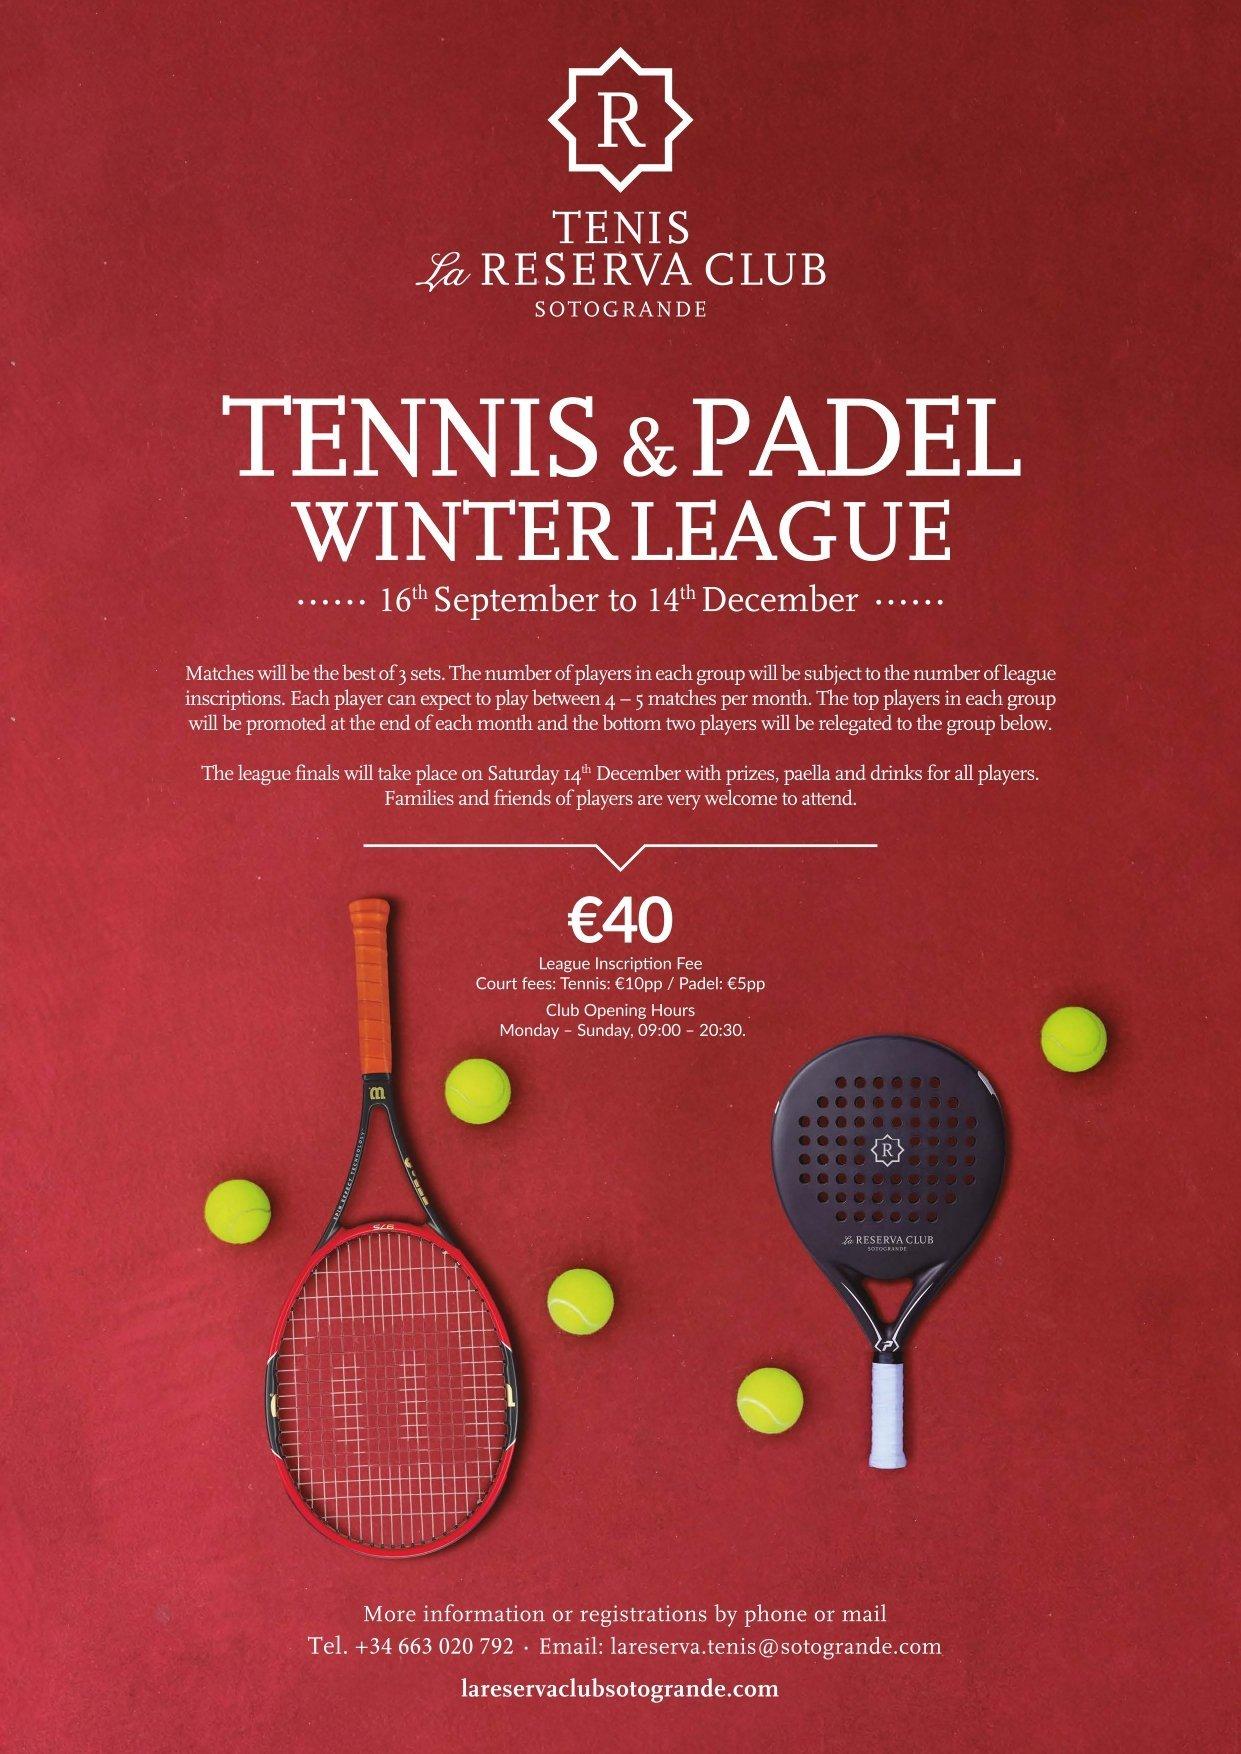 Tennis & Padel Winter League